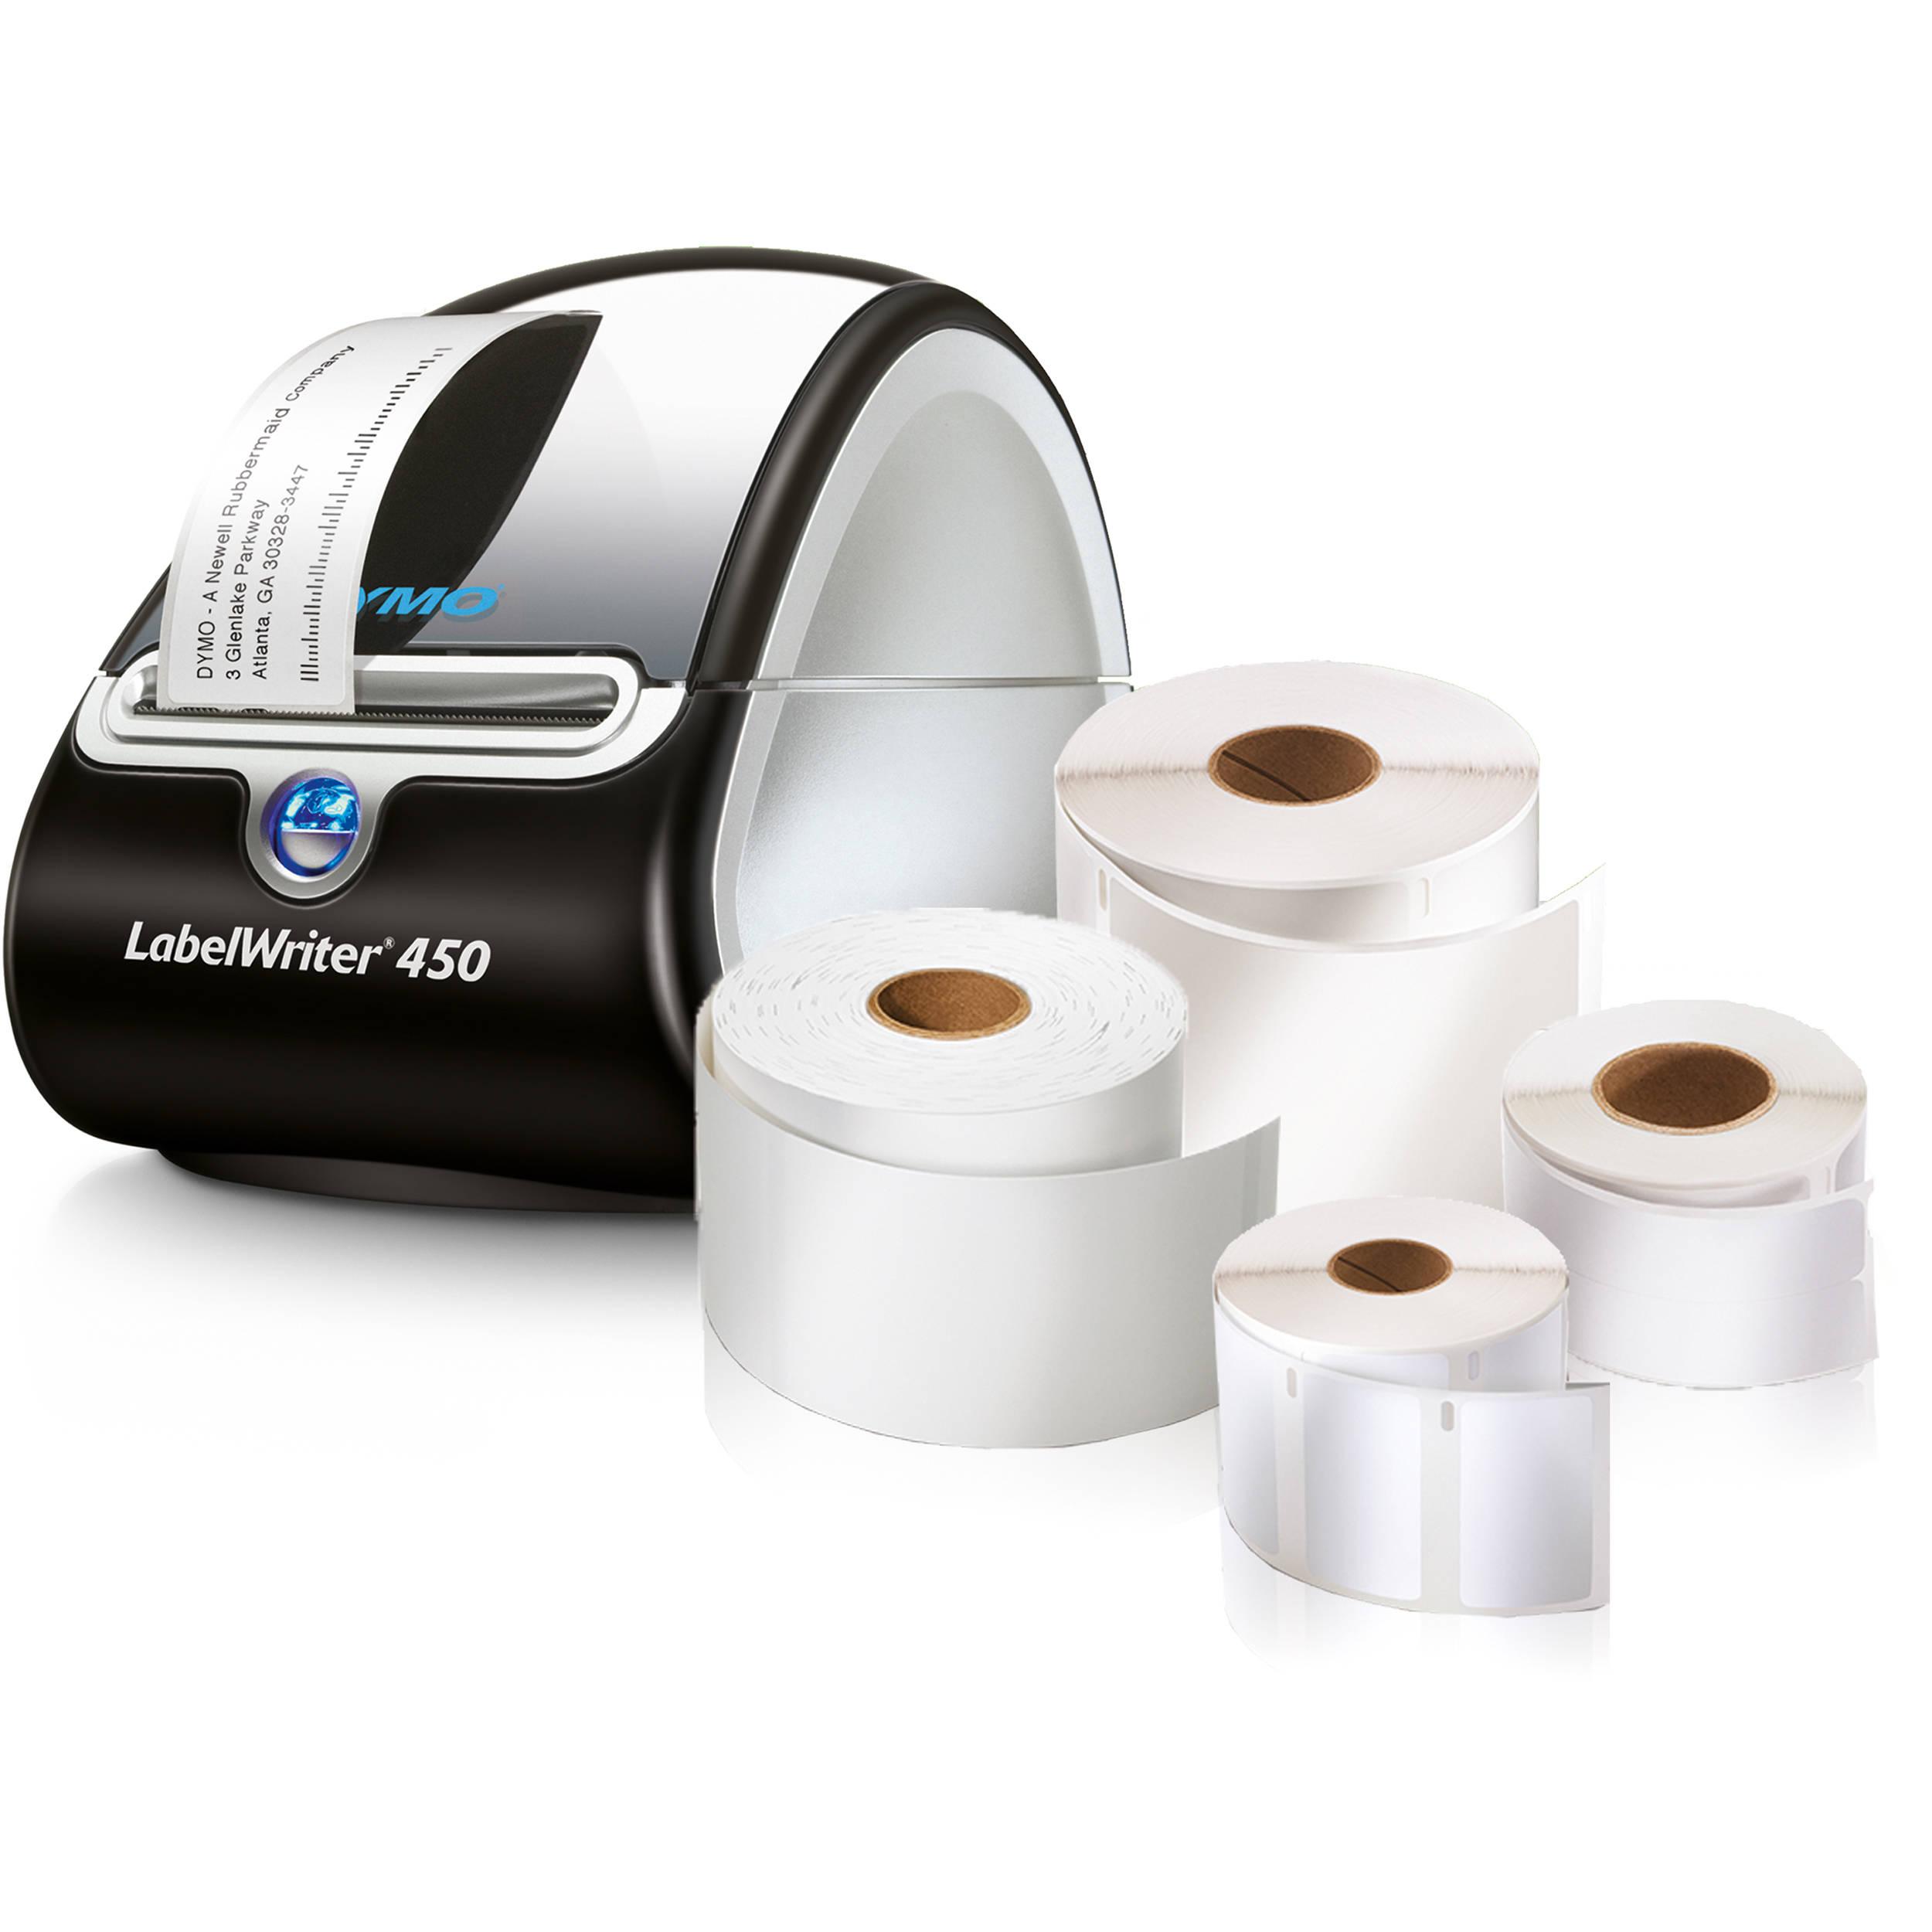 gallery easyfeed label feeder com petology display au item juwel automatic